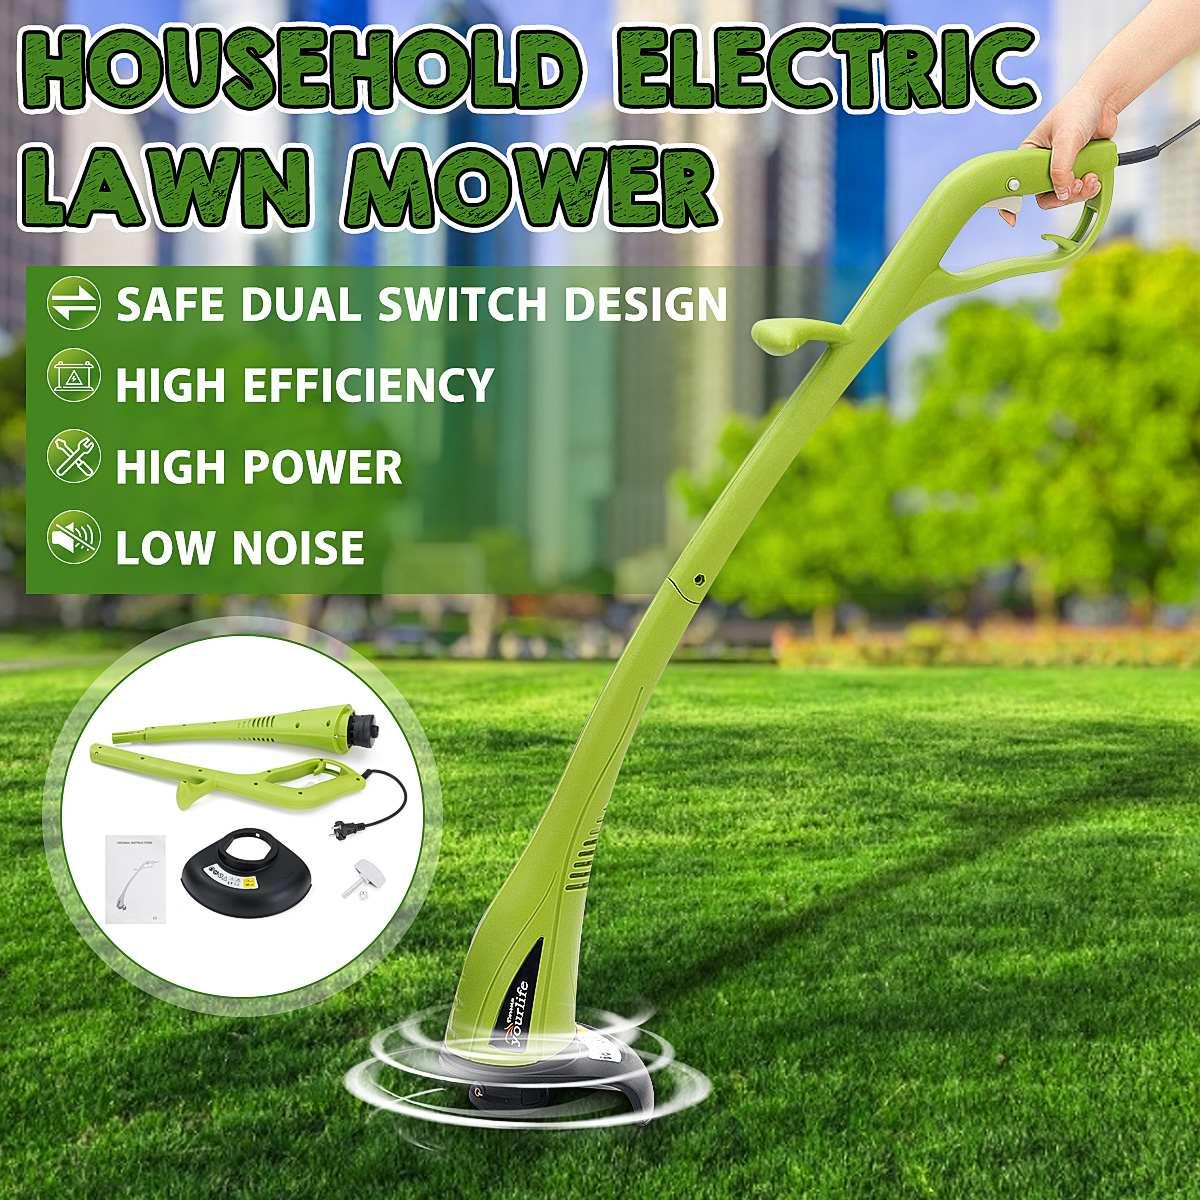 300W Electric Lawn Mower 12500rpm 19cm Grass Trimmer Hand Cleaner Grass Cutter Machine Detachable Lawnmower Garden Power Tools